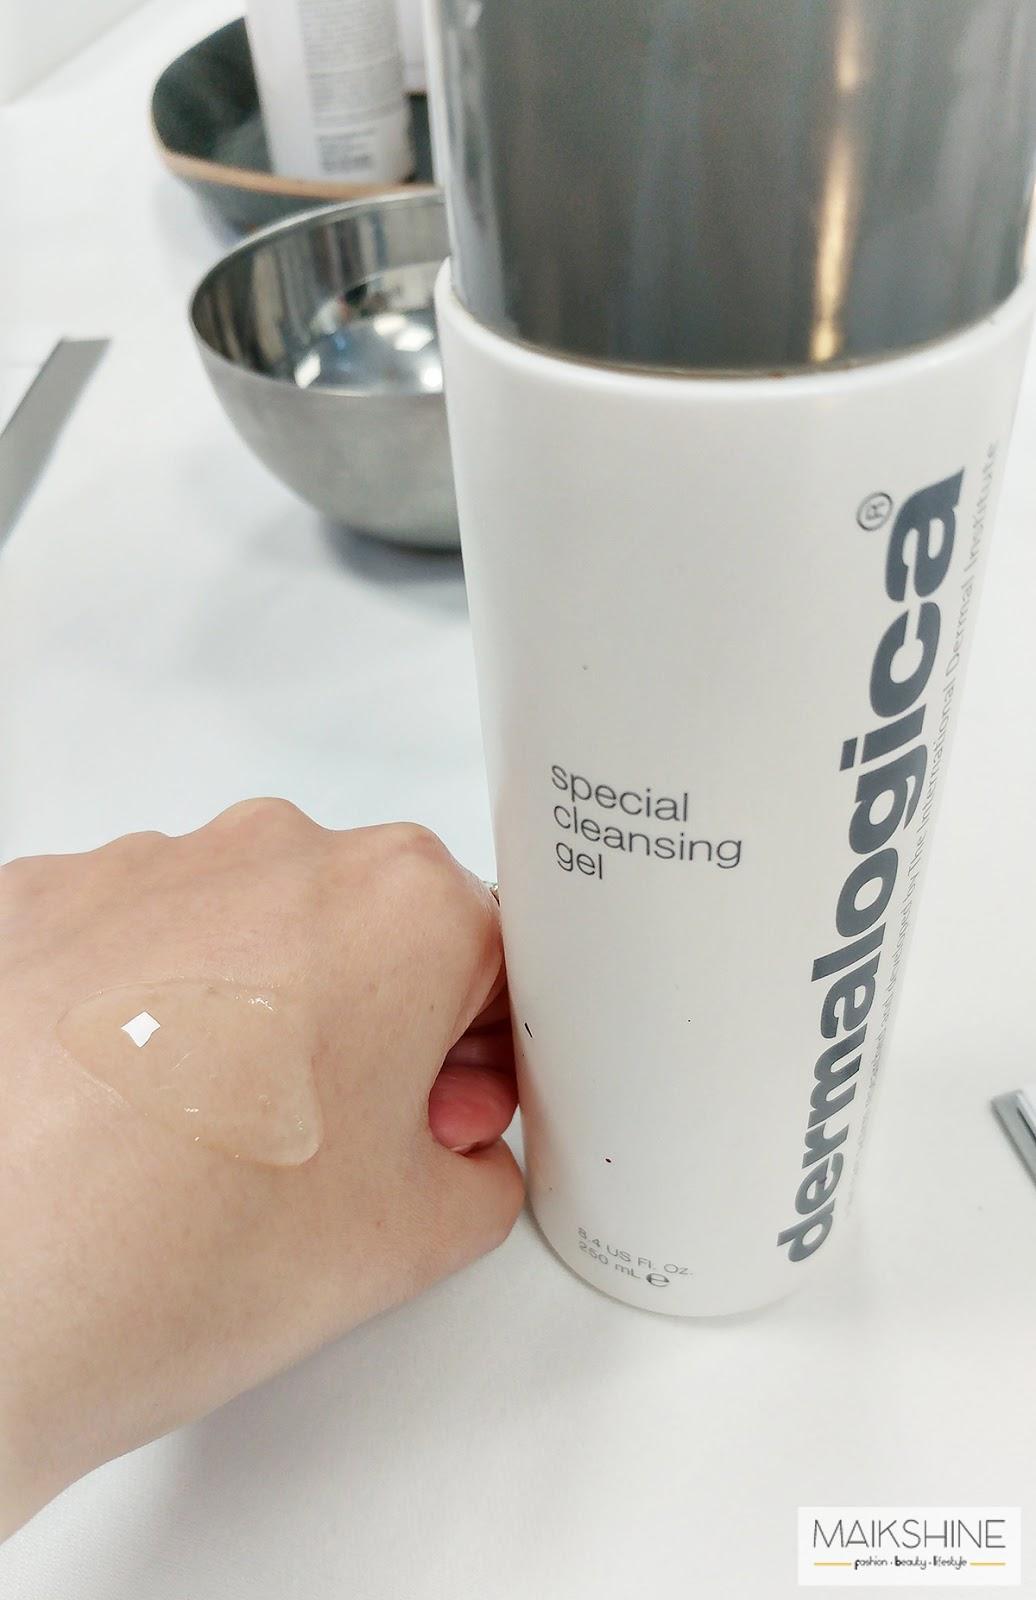 Limpieza facial Special Cleansing Gel Dermalogica